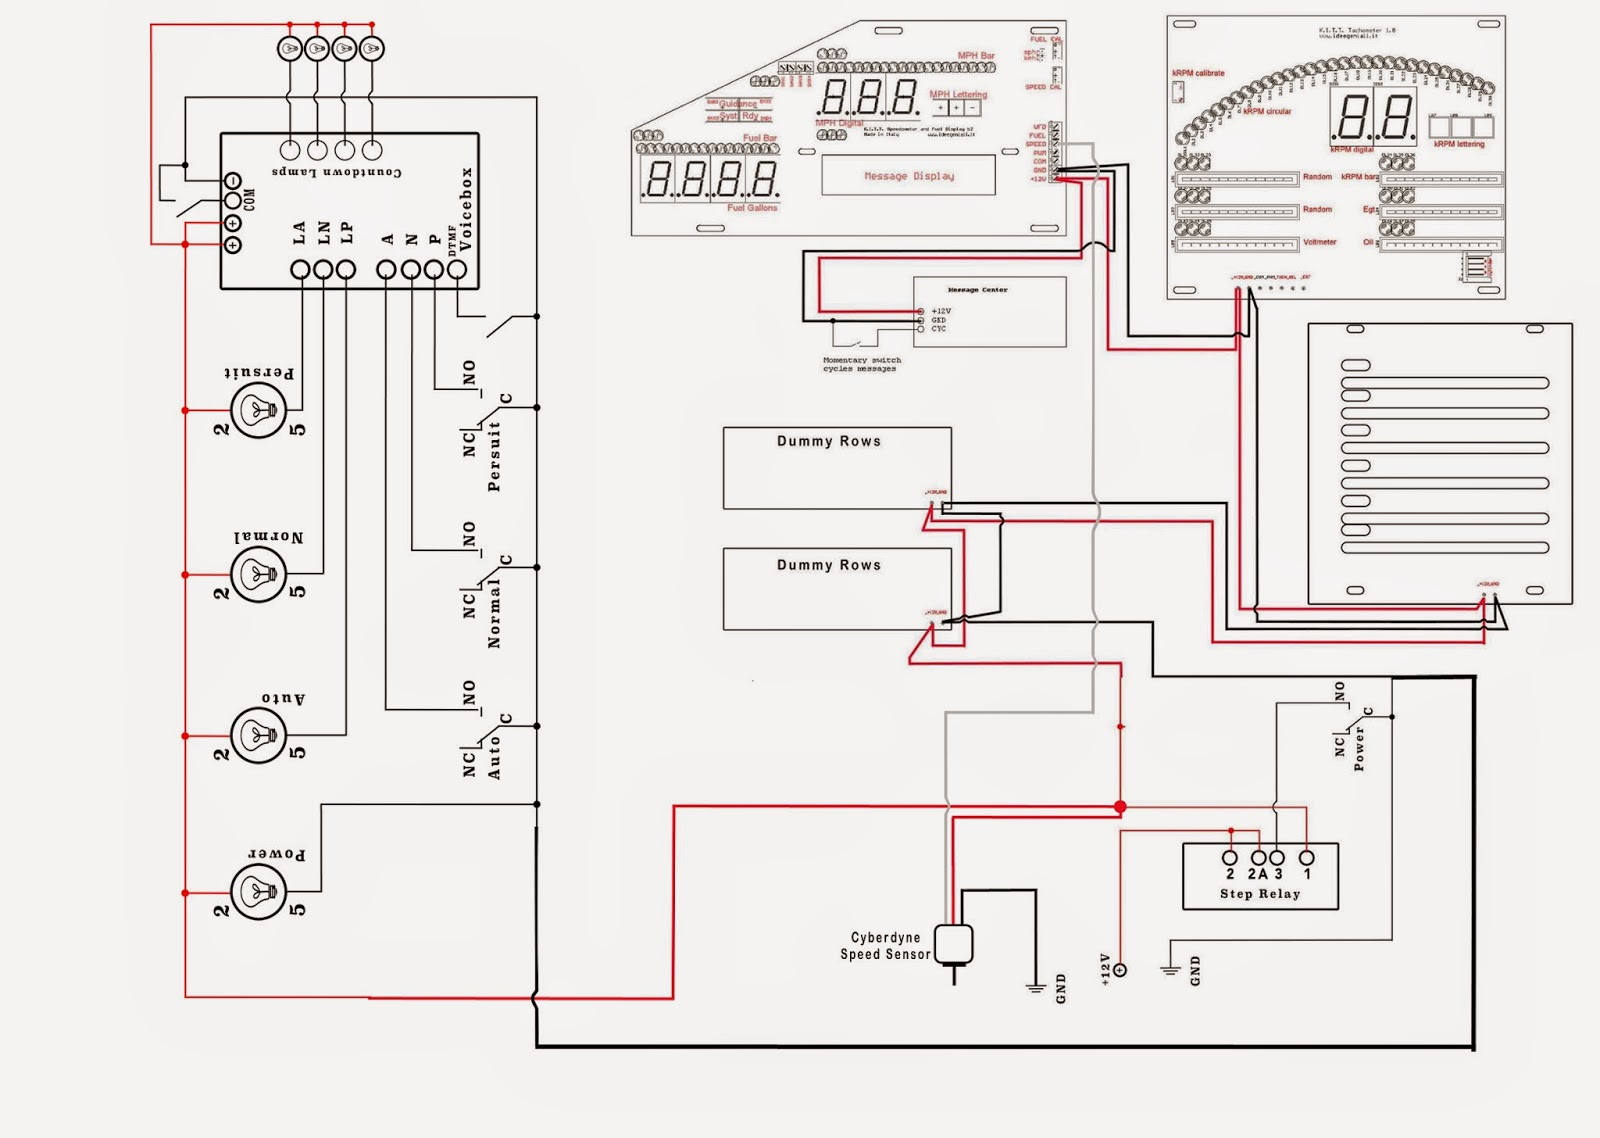 wiring diagram cole hersee rocker light 3 light wiring diagram Perko Switch Wiring Diagram  Two Battery Switch Wiring Diagram Cole Hersee Momentary Switch Momentary Contact Switch Wiring Diagram